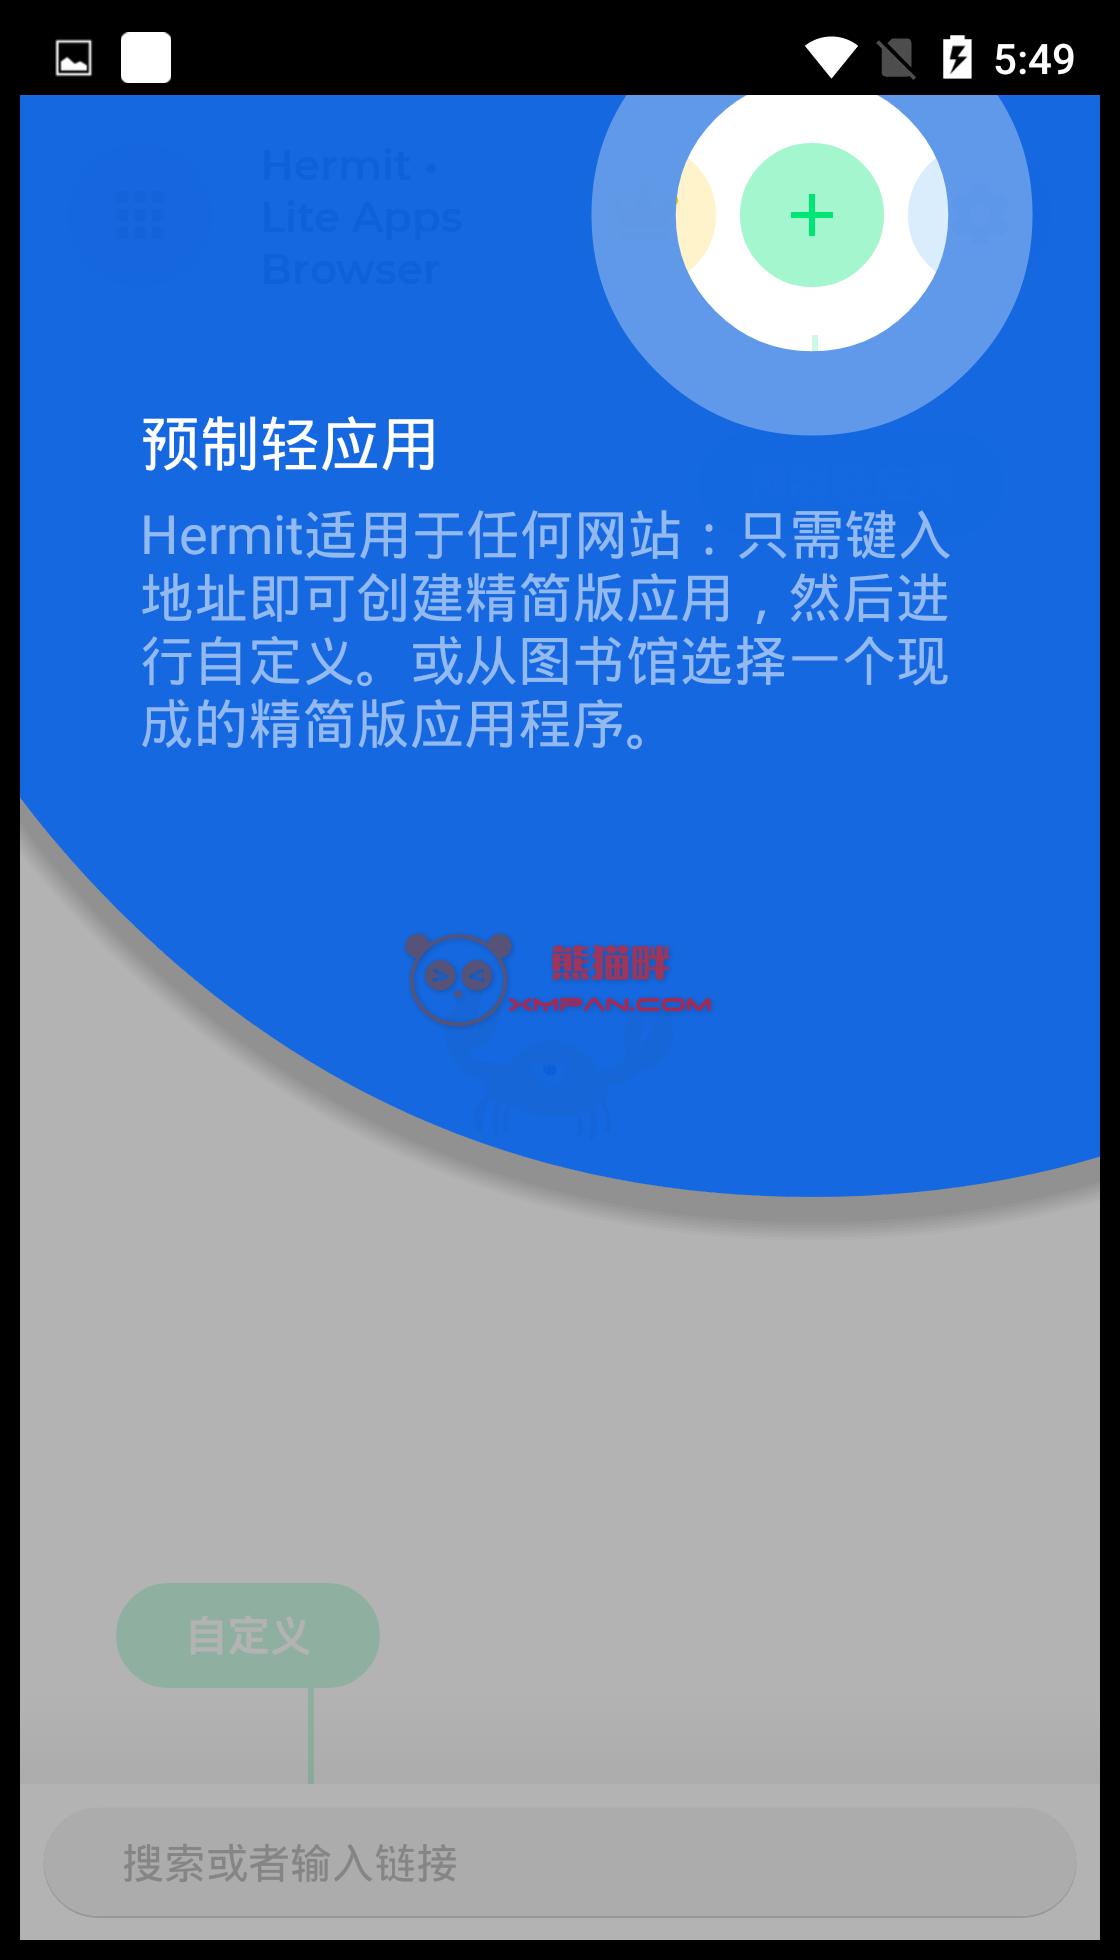 Android Hermit(网页转应用)v16.0.4 高级版